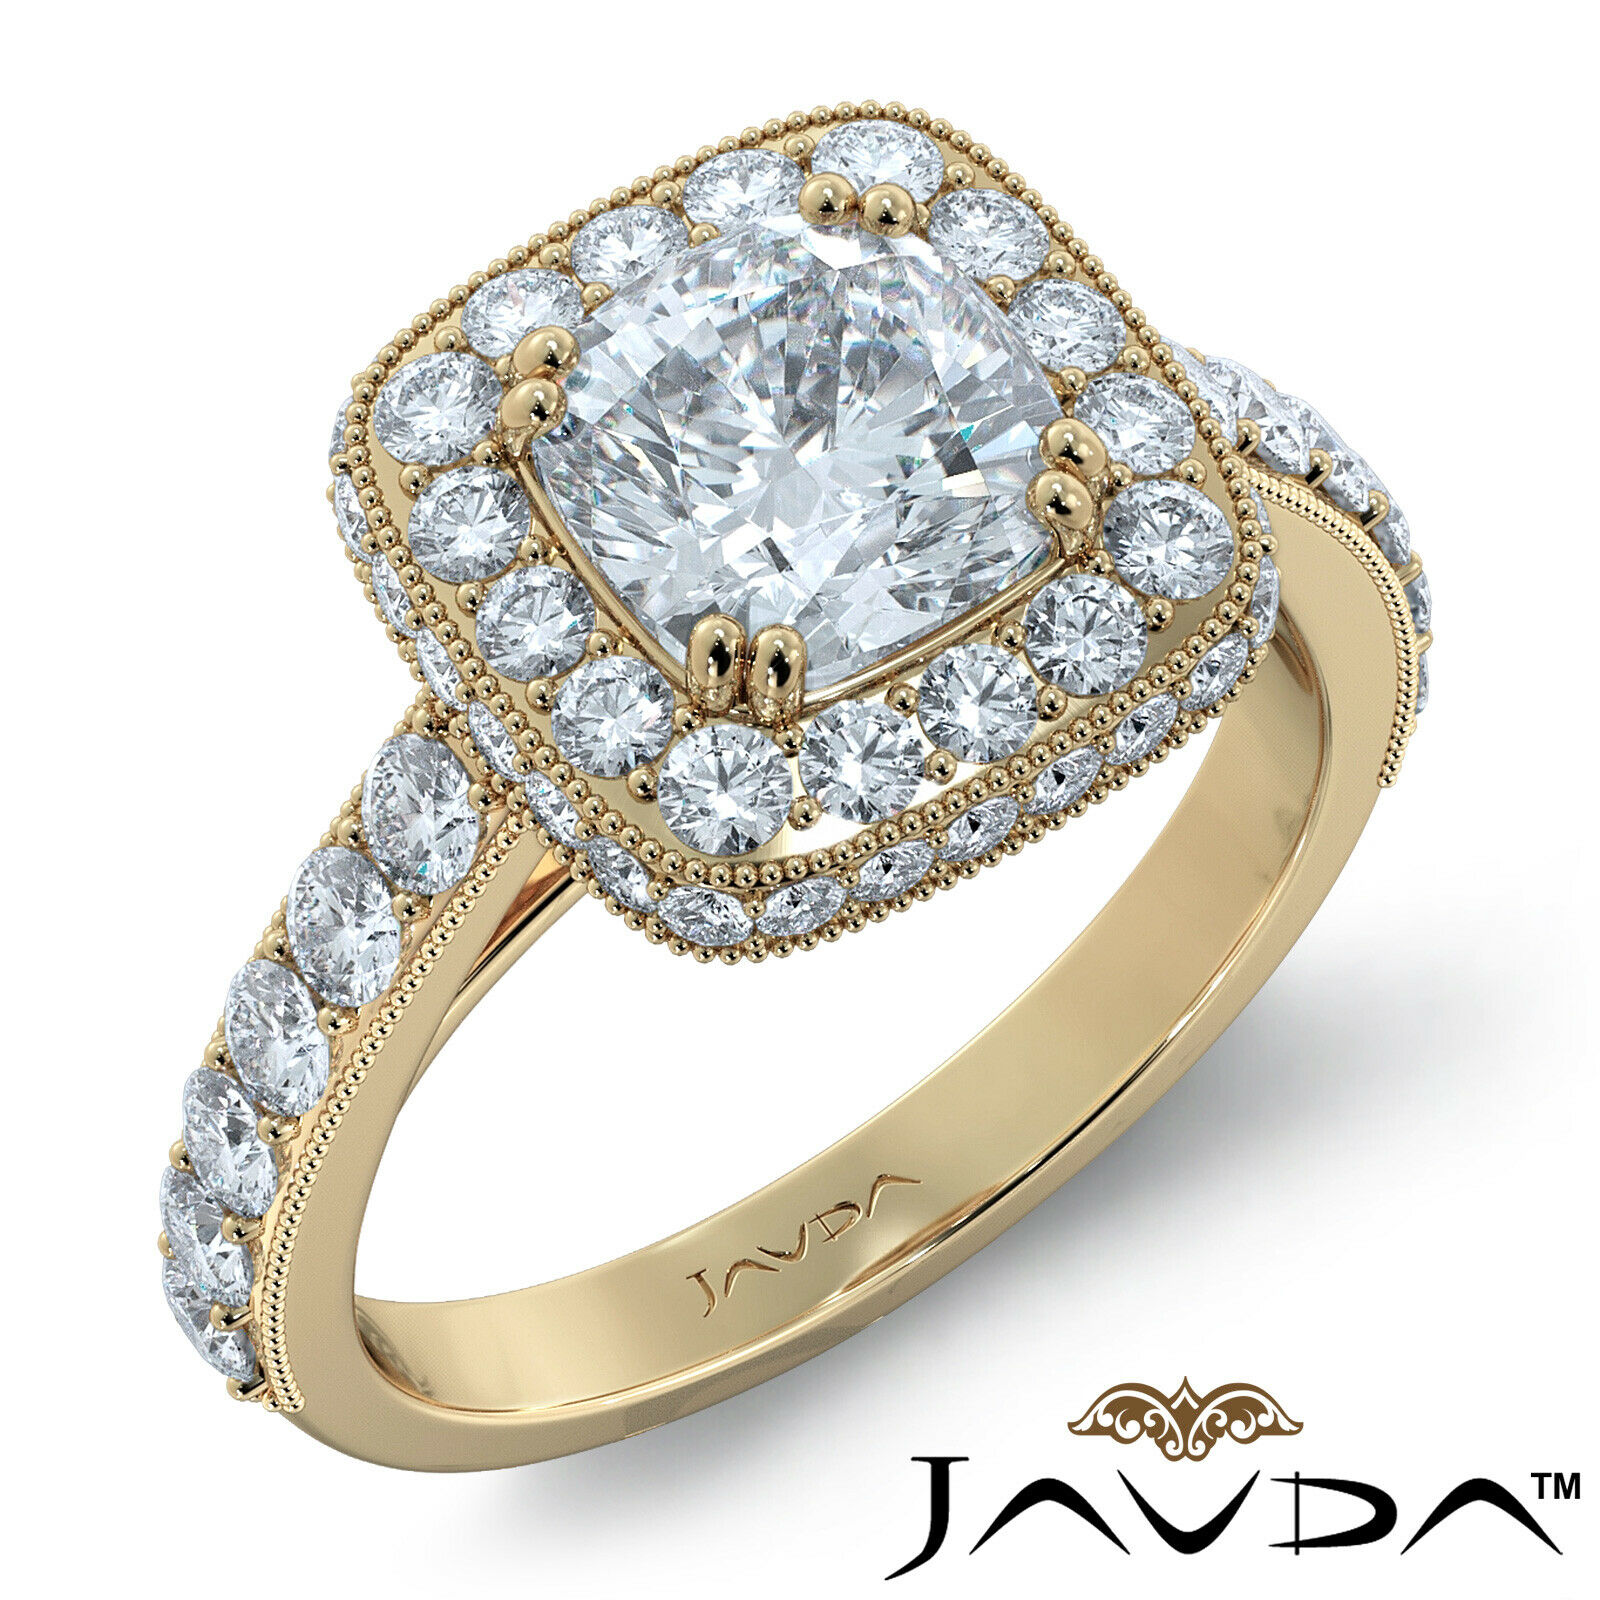 1.94ctw Milgrain Floral Basket Cushion Diamond Engagement Ring GIA E-VVS1 W Gold 7